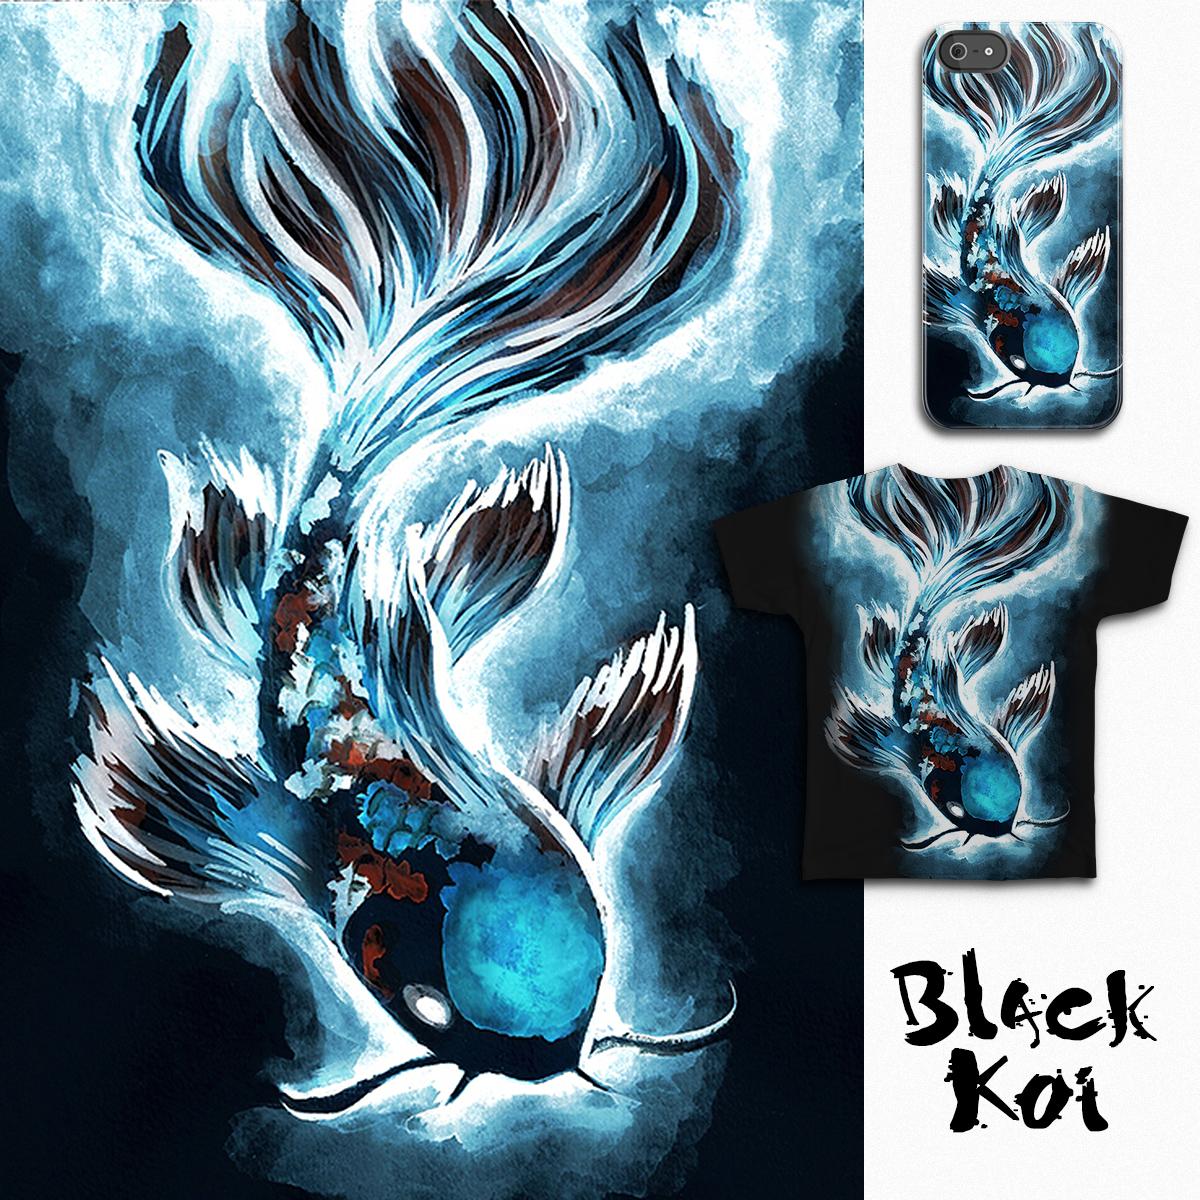 Black Koi by Gneiss on Threadless